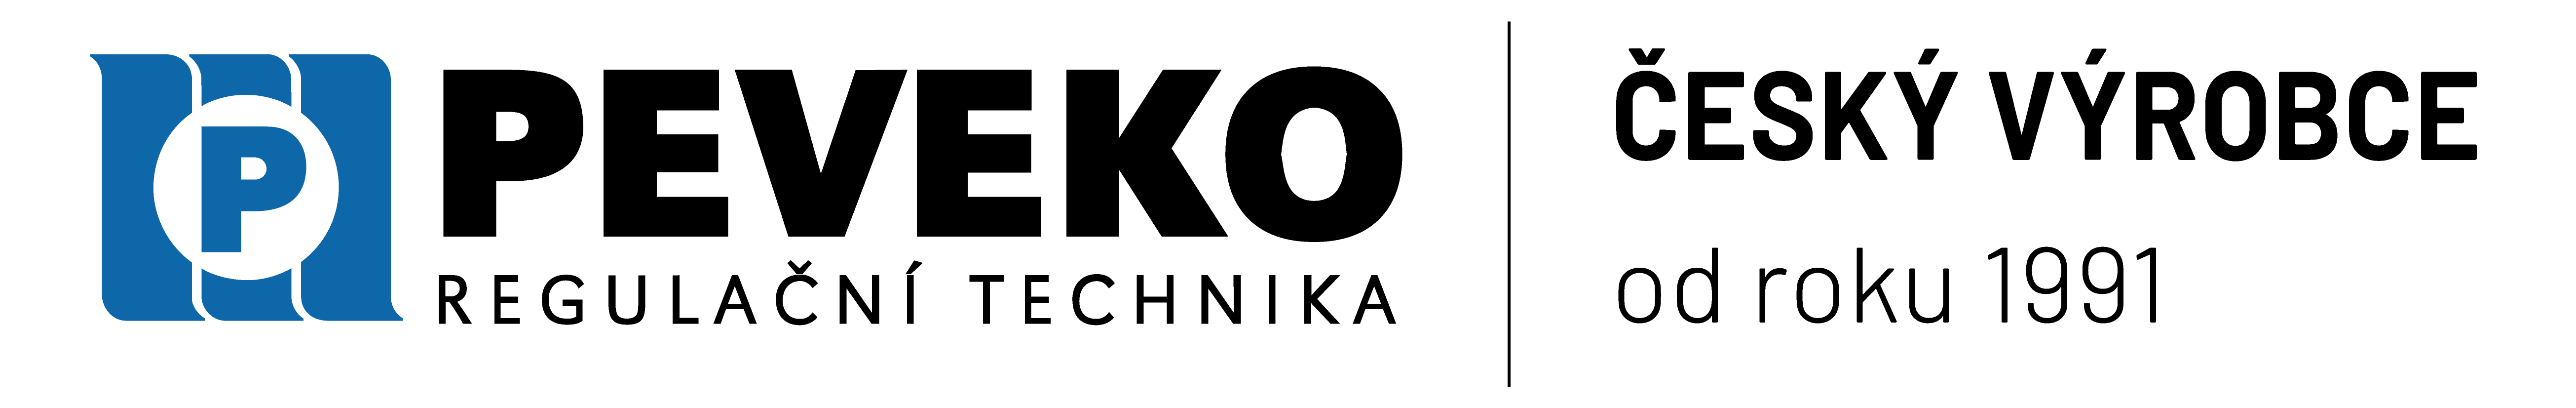 PEVEKO